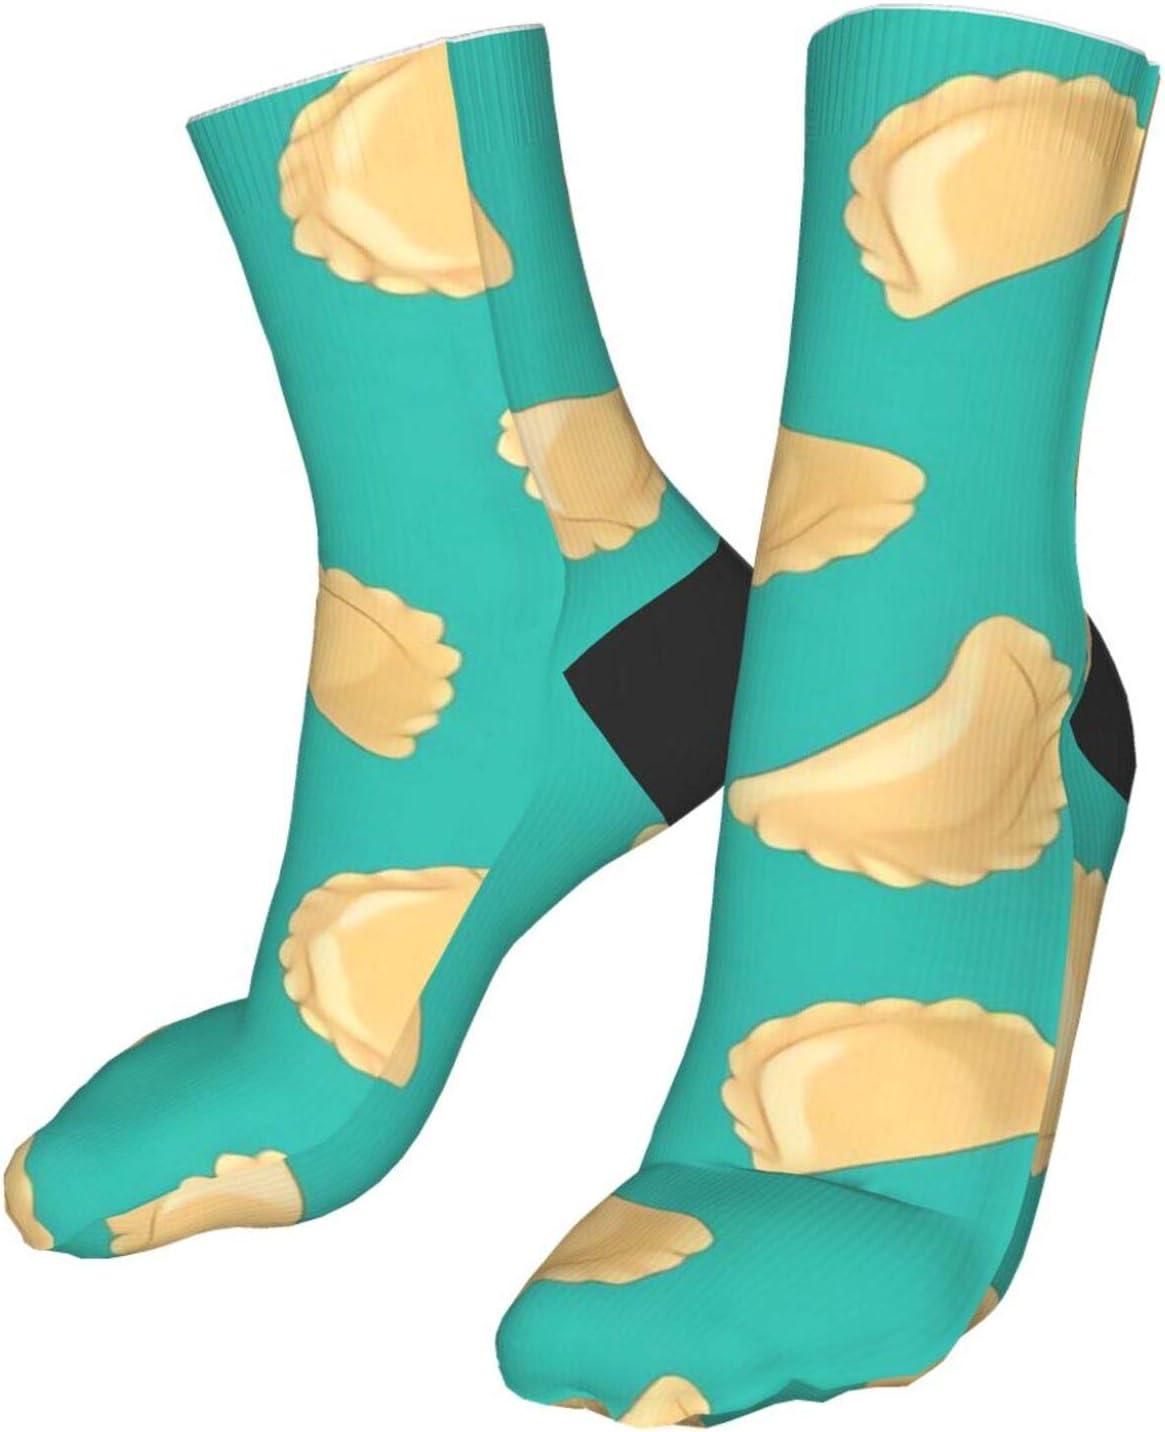 ~ Dumplings Pierogi Varenyky Pelmeni Food and Drink Compression Socks Unisex Fun Novelty Crazy Dress Crew Socks